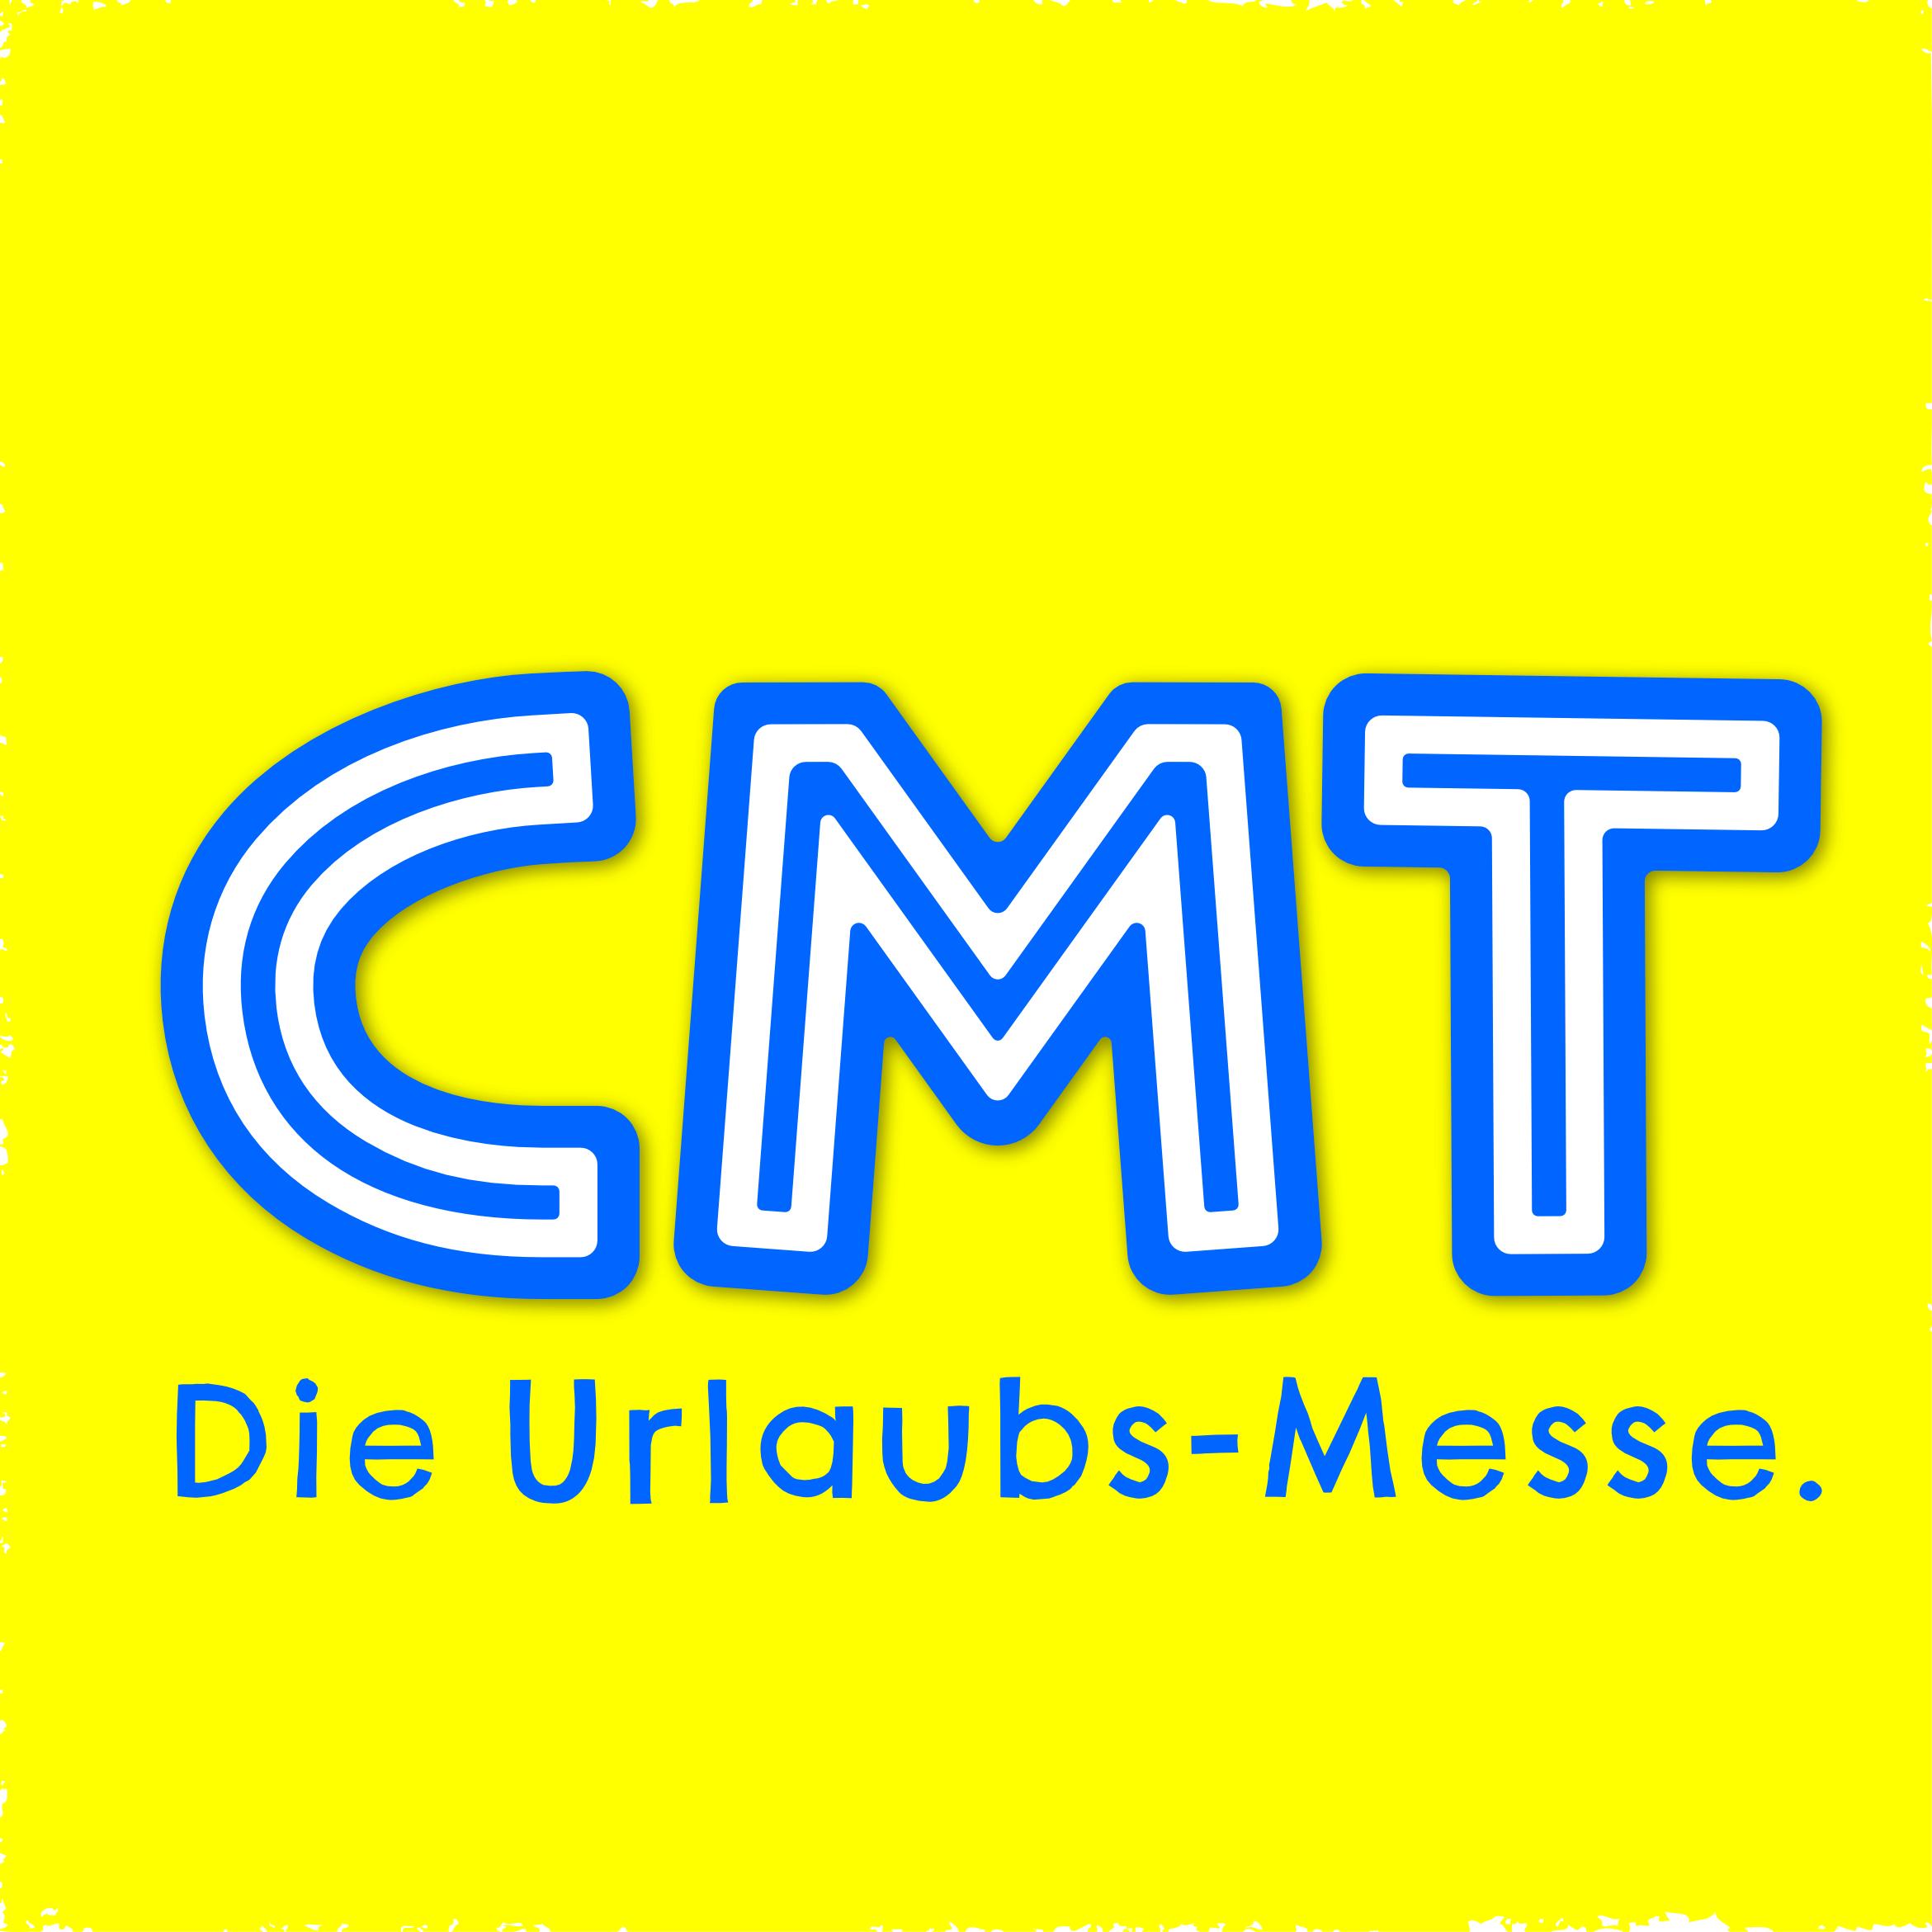 CMT Messe Stuttgart 12. – 20. Januar 8-G40